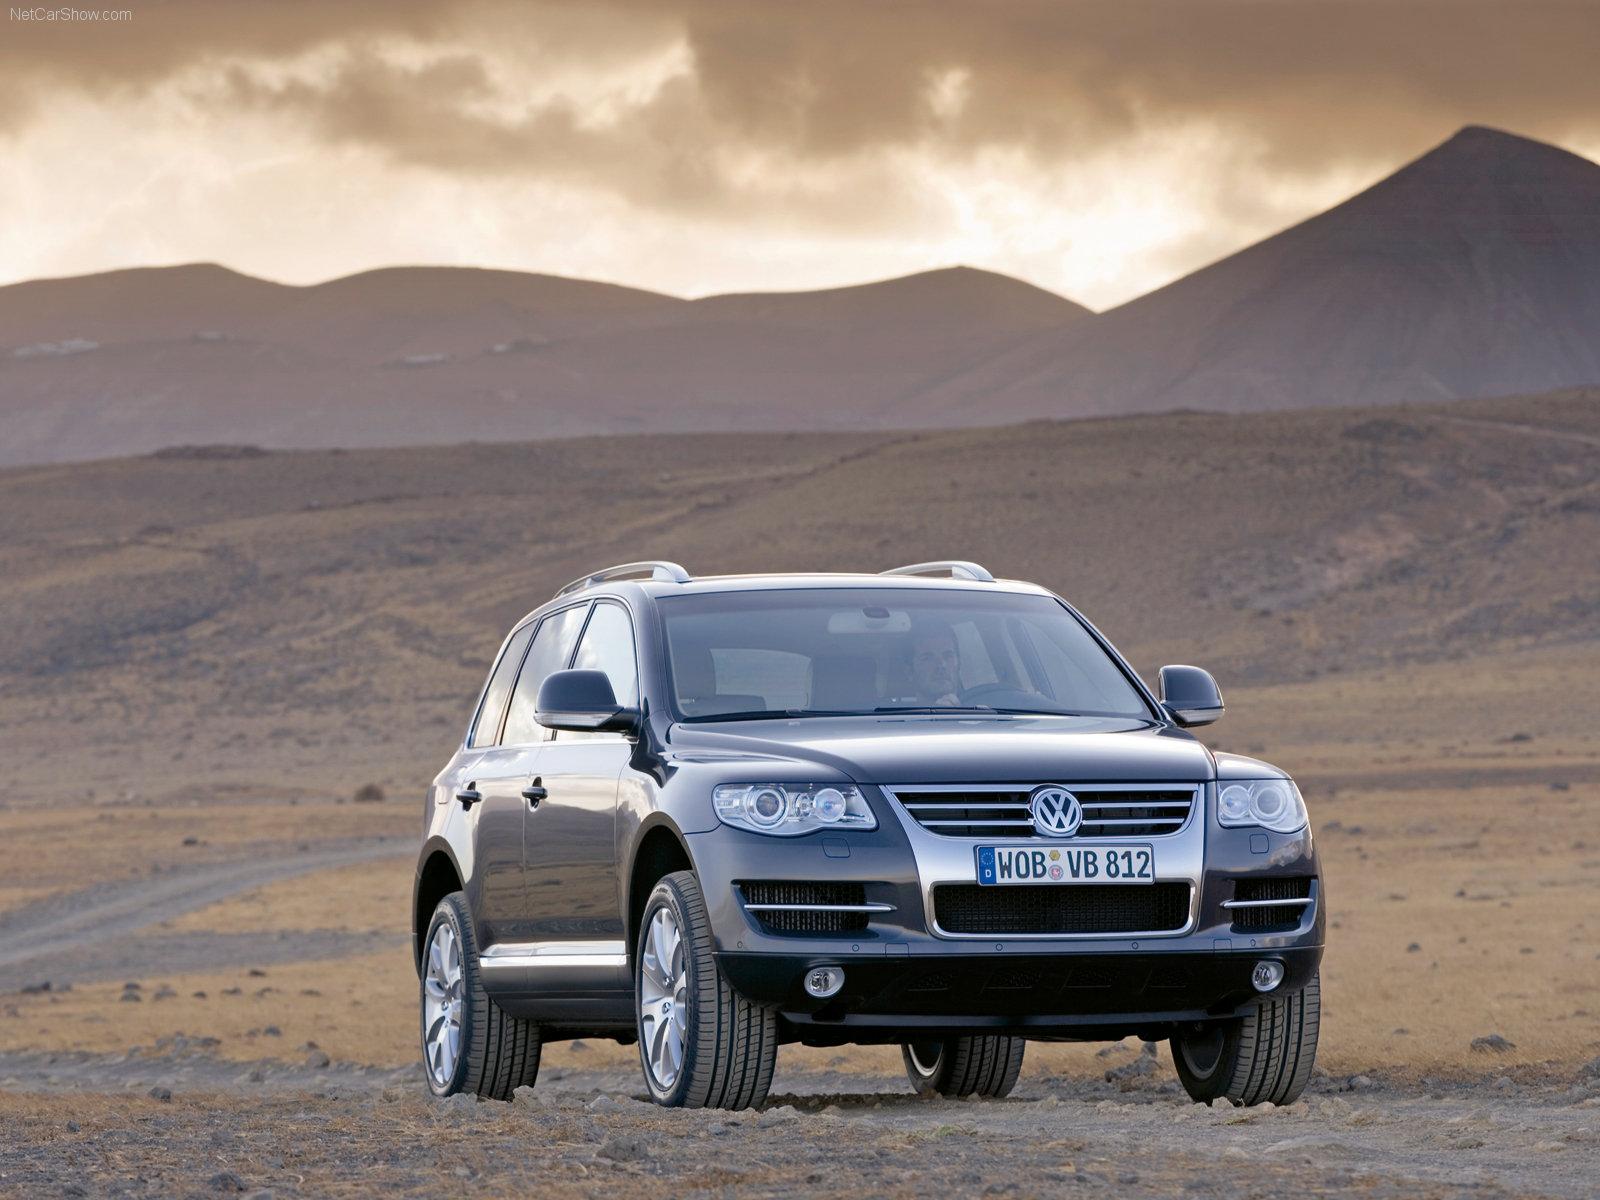 http://w04.ru/foto/Volkswagen-Touareg_2007_1600x1200_wallpaper_05.jpg